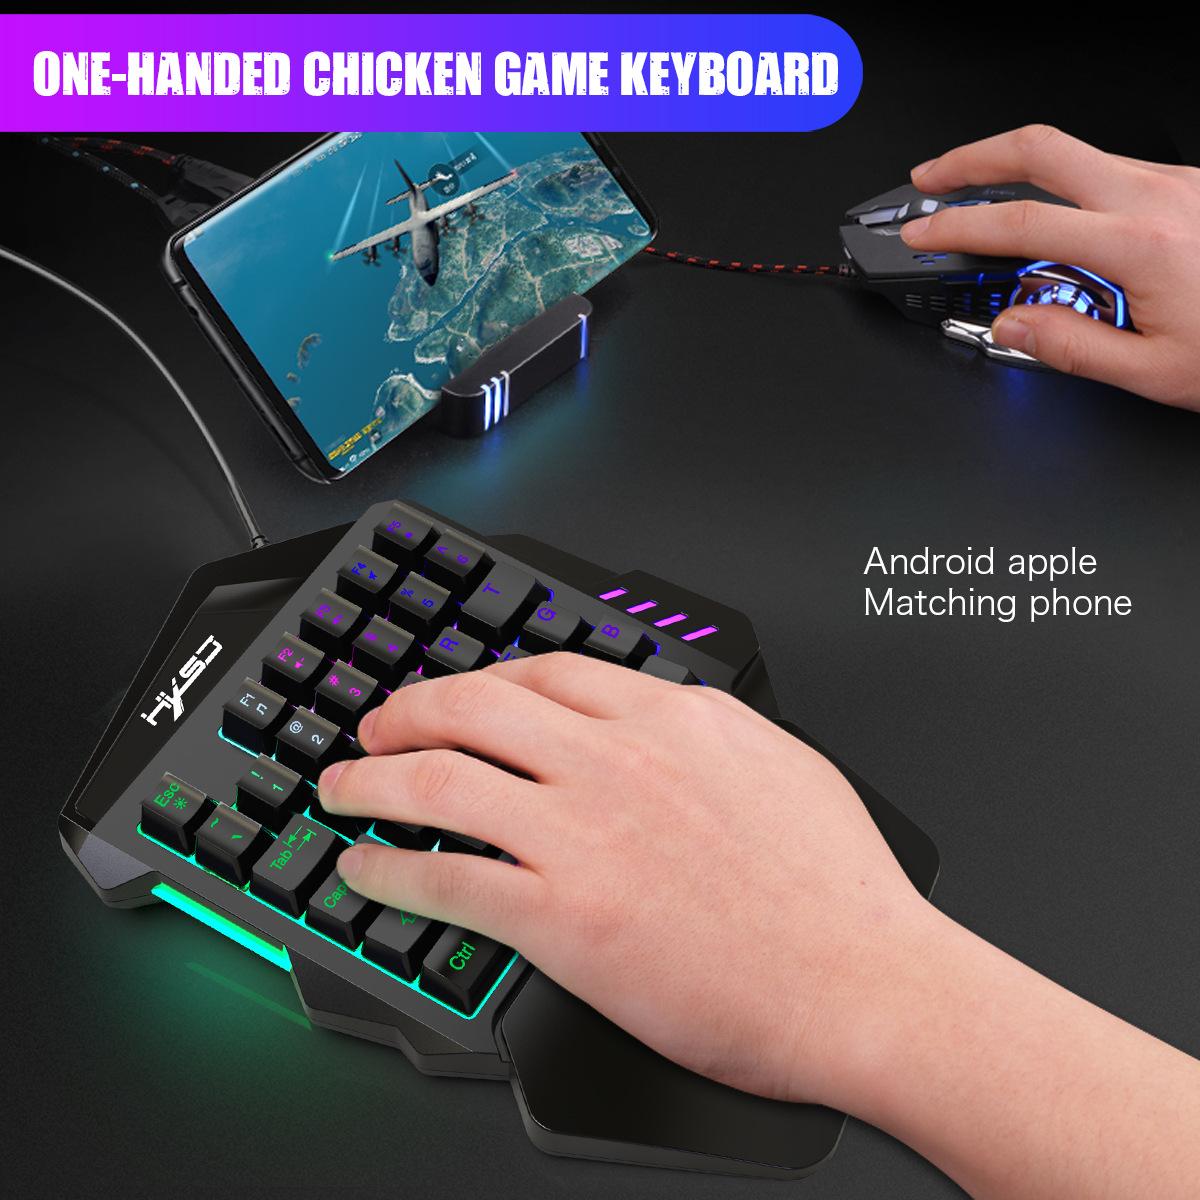 New Ergonomic Multicolor Backlight One-Handed Game Keyboard Mouse Set 35 Keys 5500DPI Gamer Gaming Mouse Keyboard Combos 9